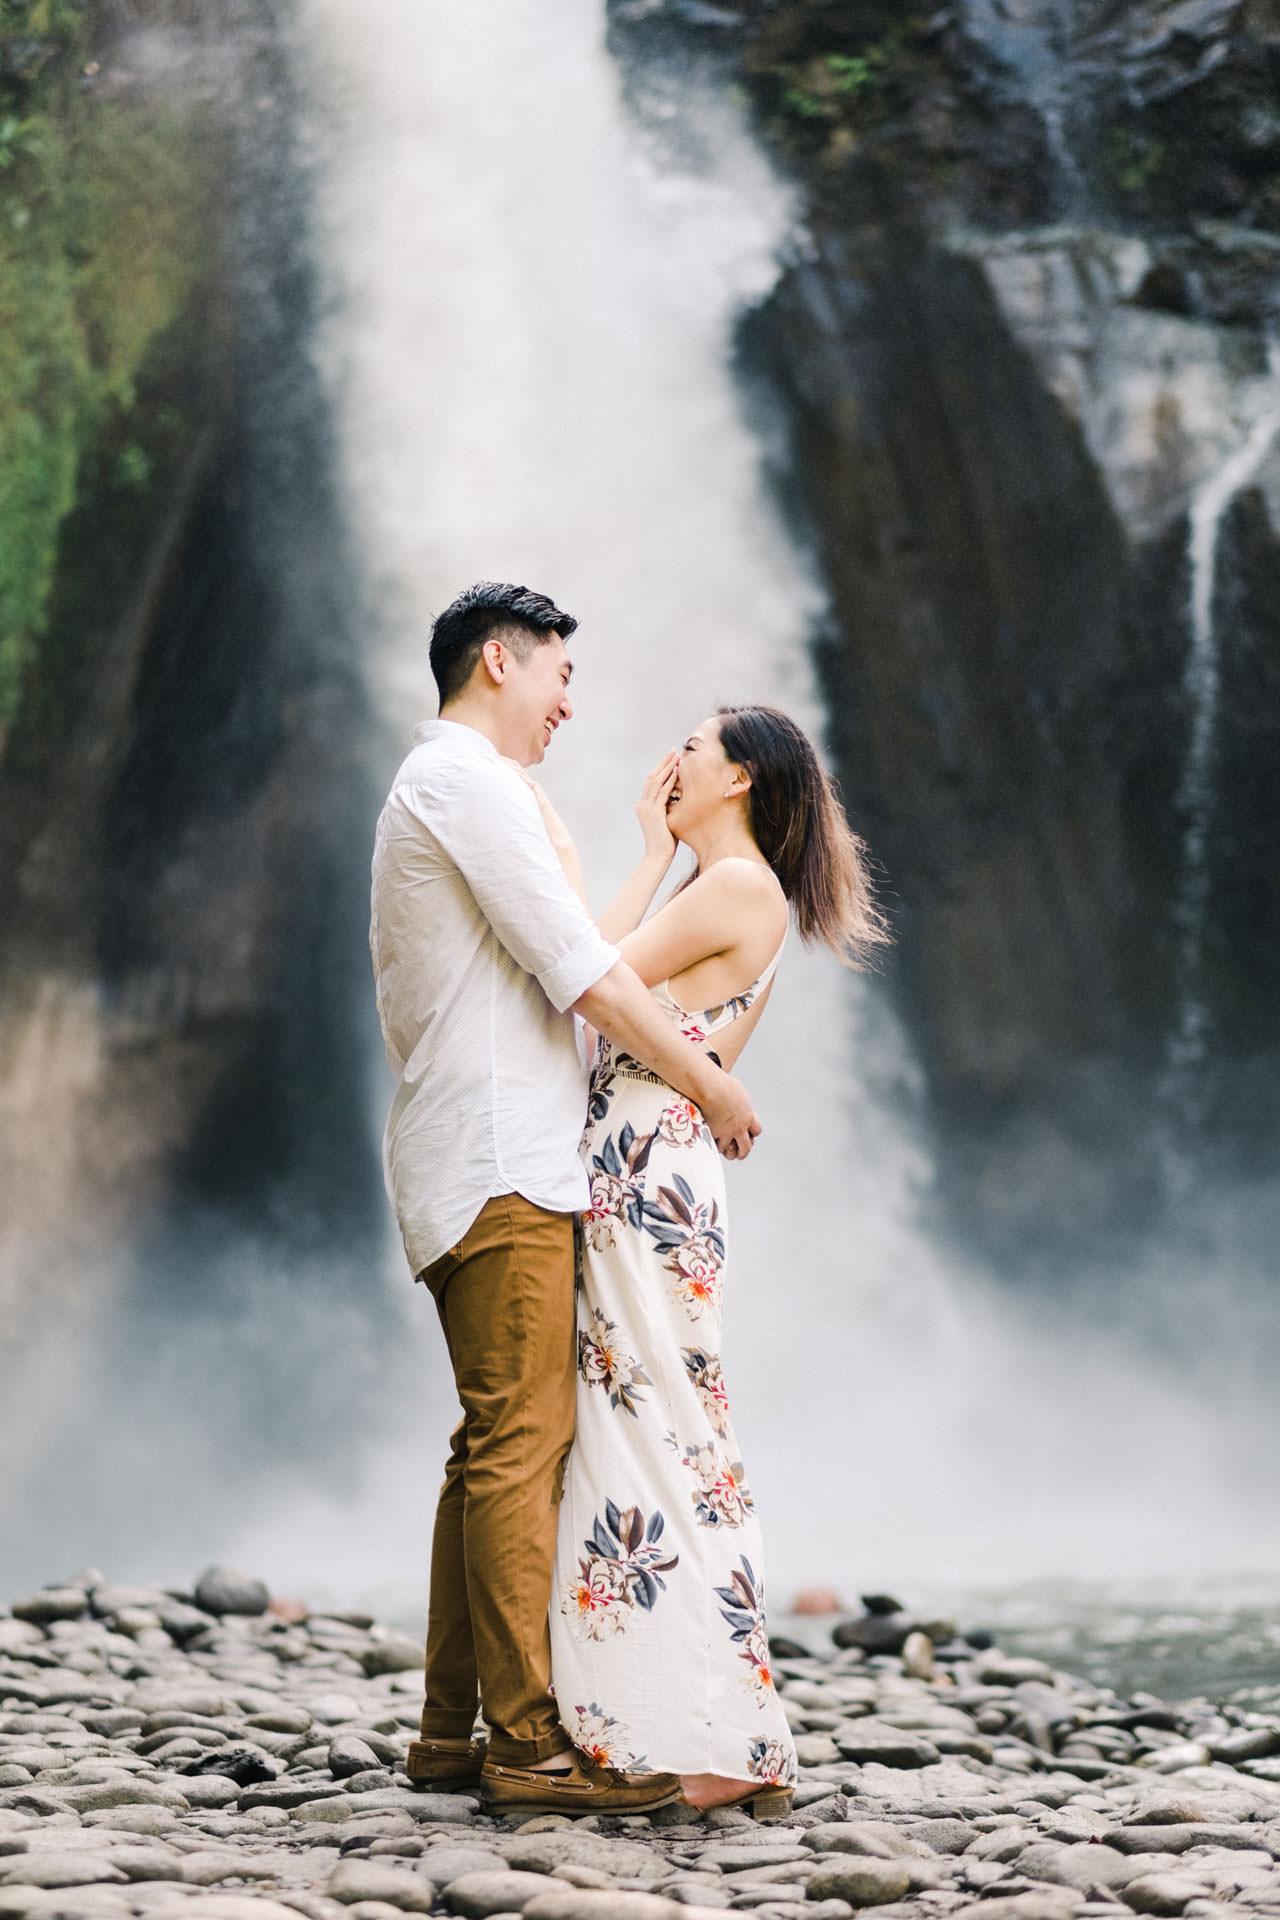 Adventurous Waterfall Surprise Proposal - Bali Vacation Proposal Ideas 16